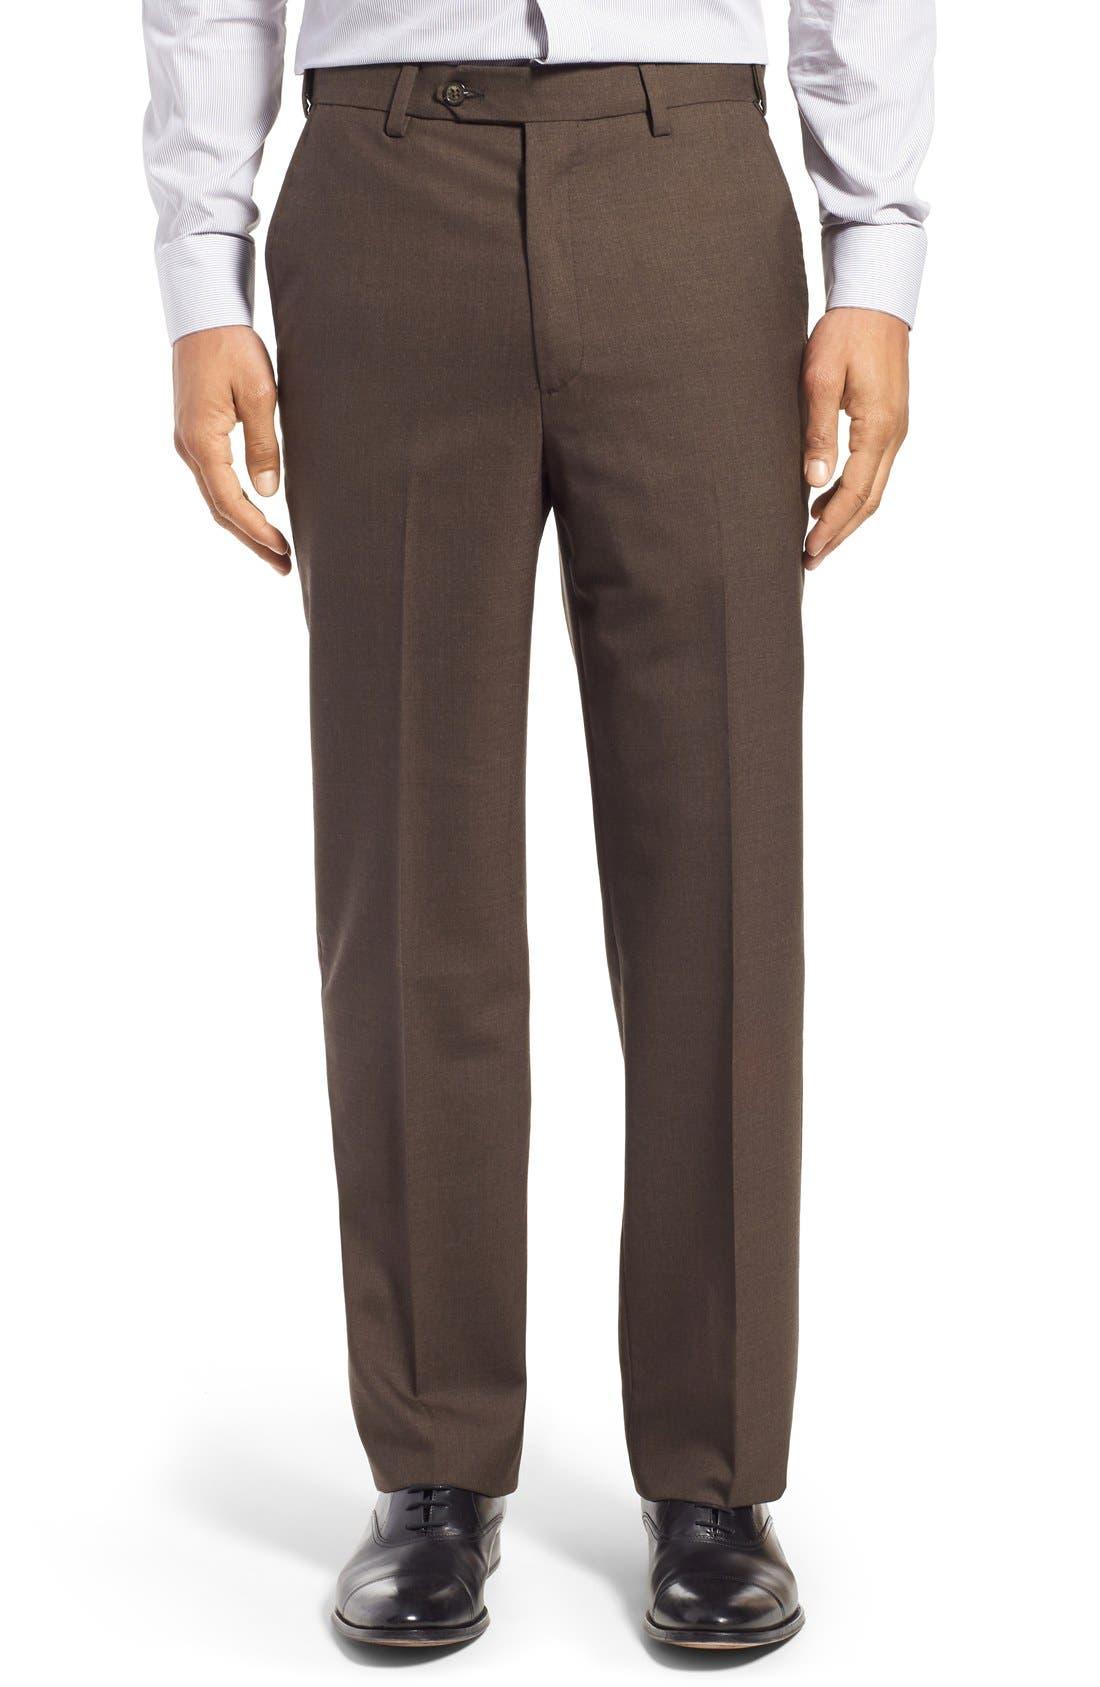 Berle Self Sizer Waist Flat Front Wool Trousers